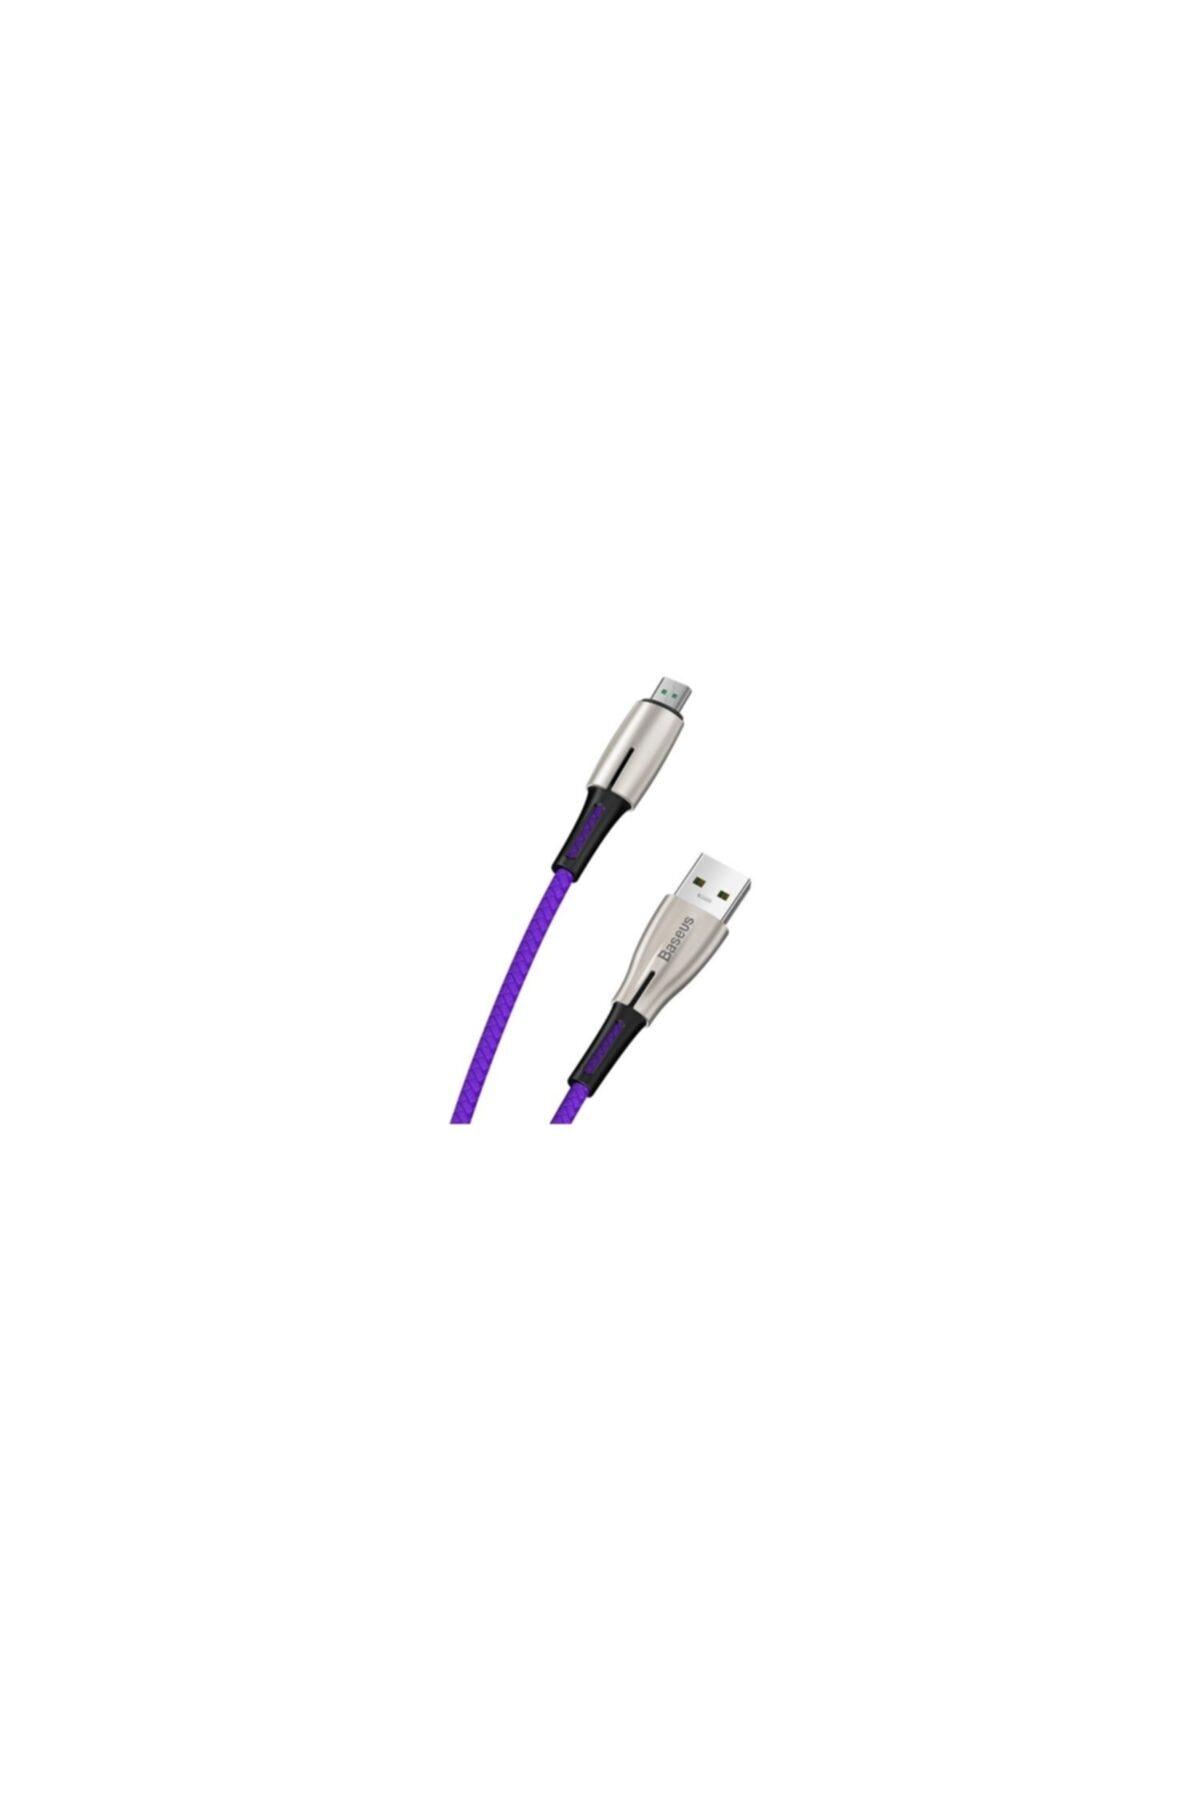 Baseus Camrd-b01 4a Waterdrop Micro Usb 4a Hızlı Şarj Usb Kablo 1 Mt 2